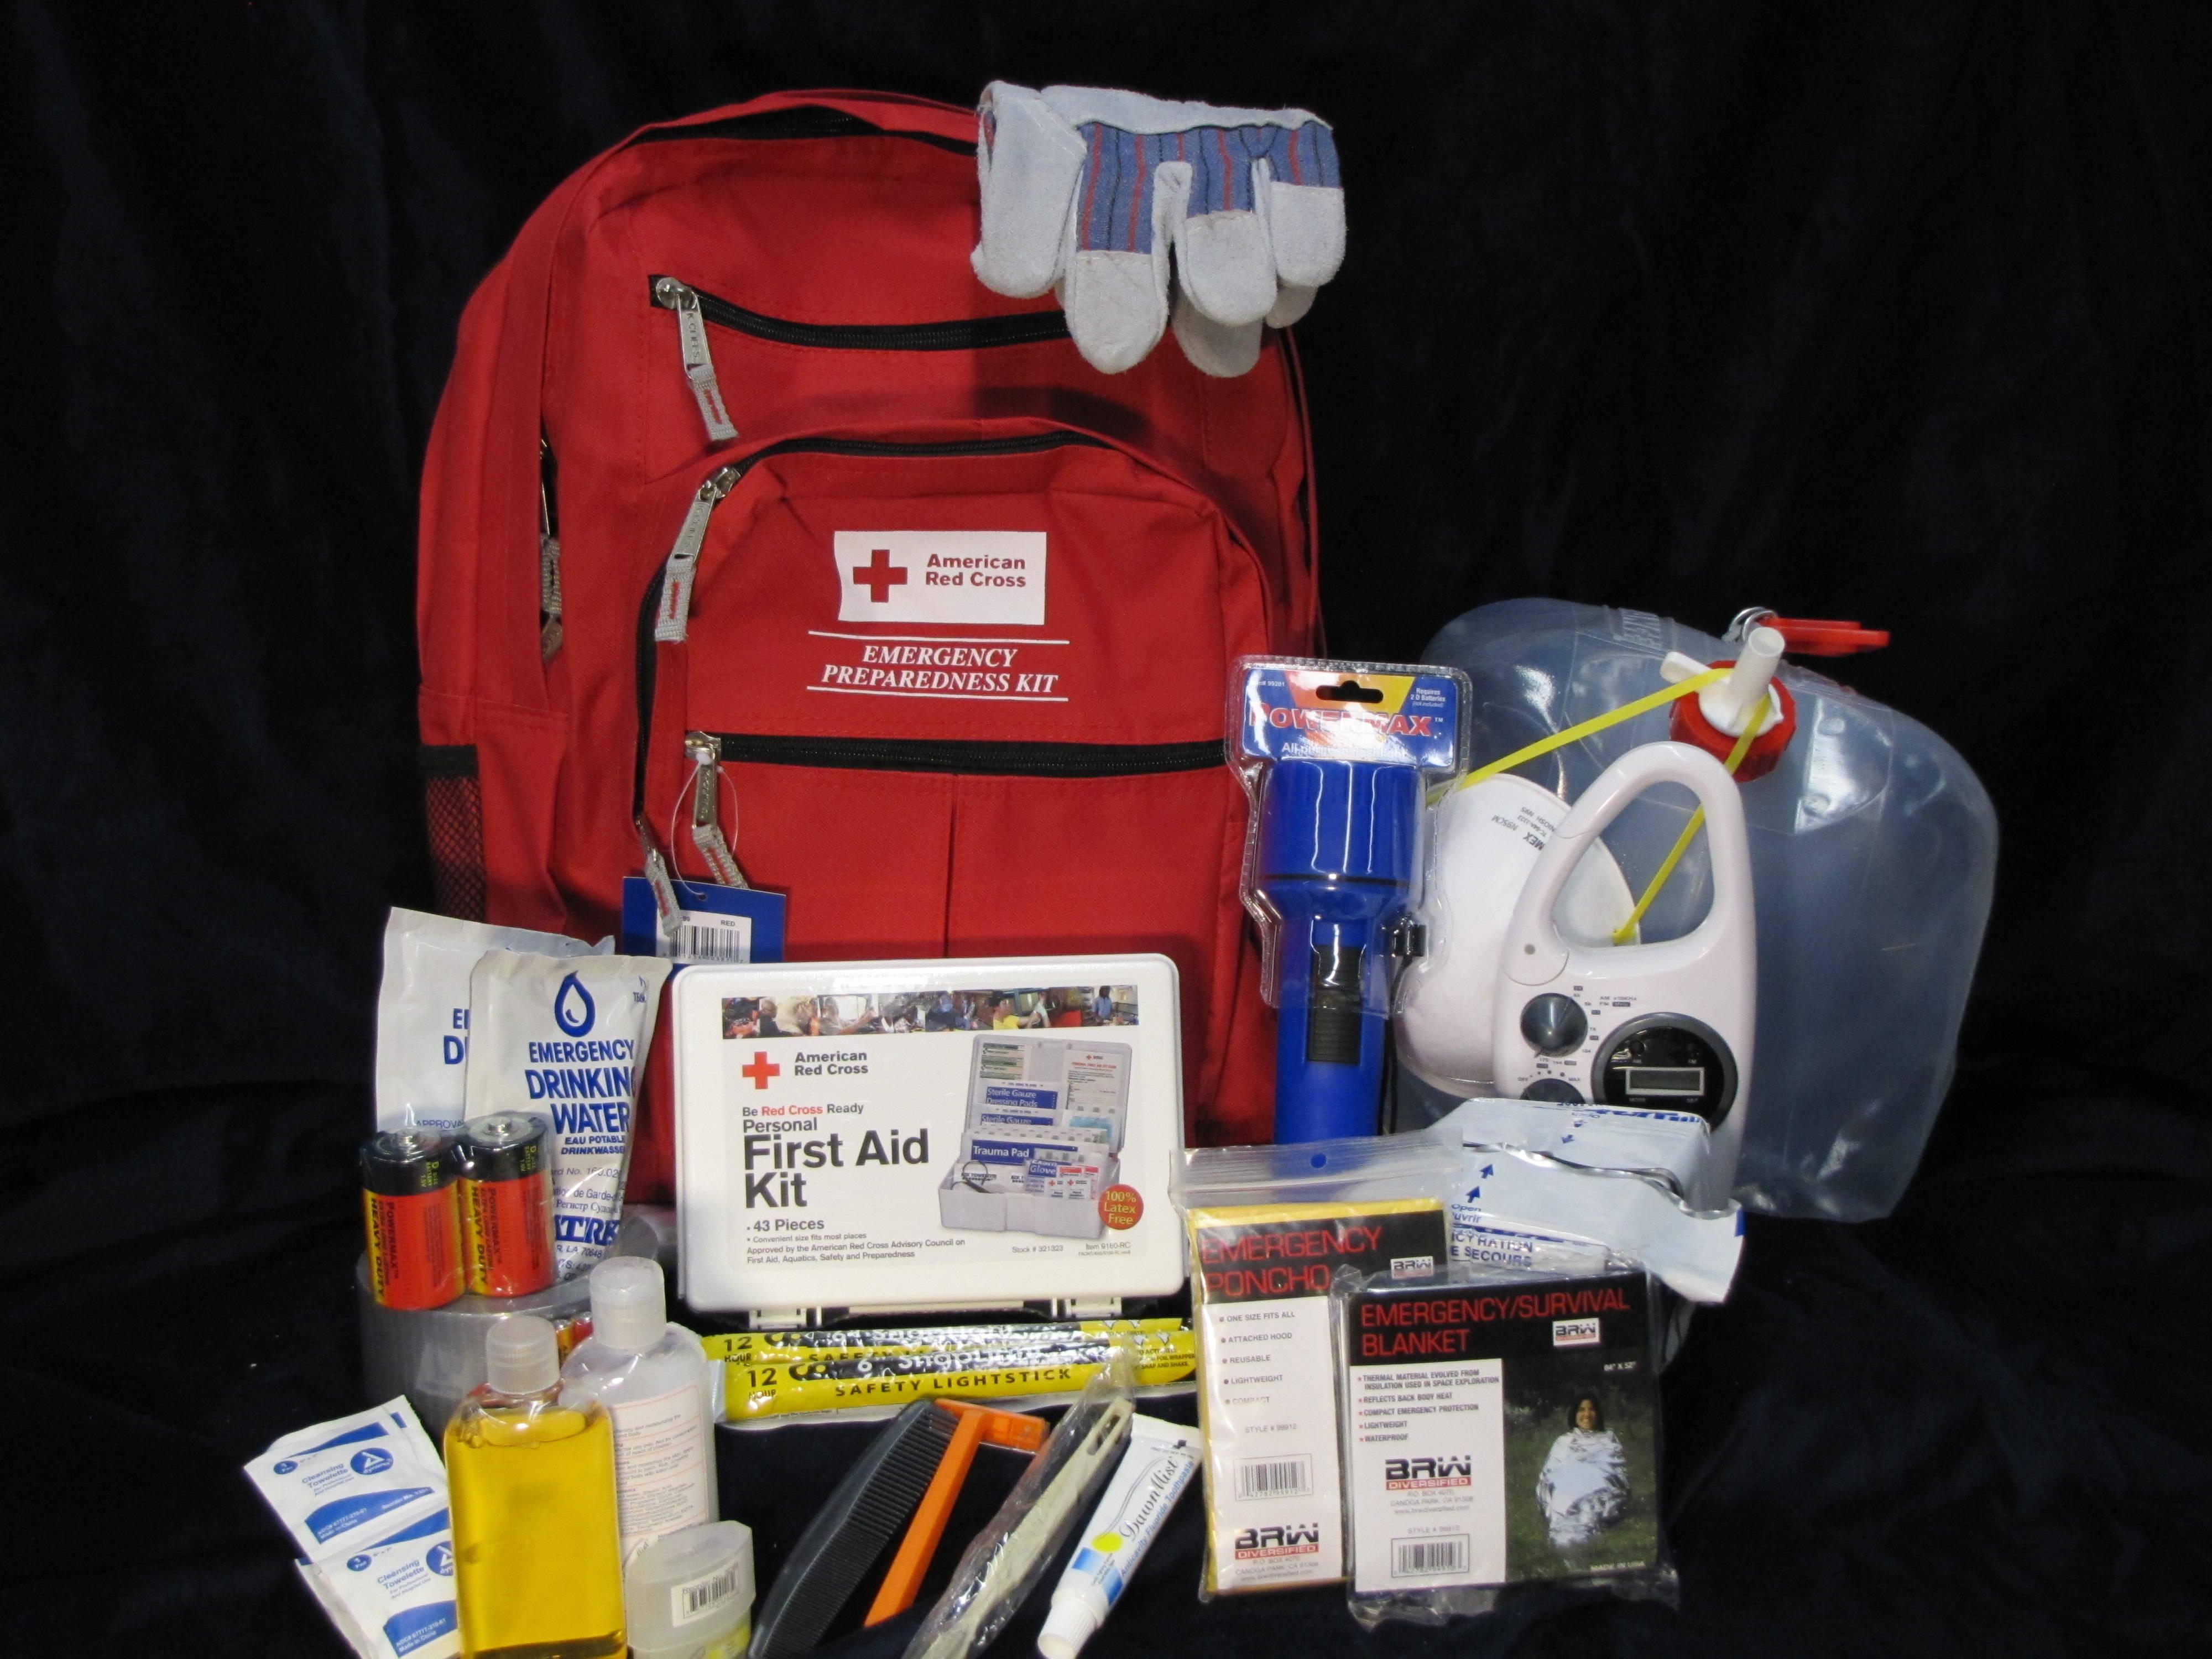 e9c982b0e7f0eb9a9e5b_Emergency-PrepareKit2011-028.jpg